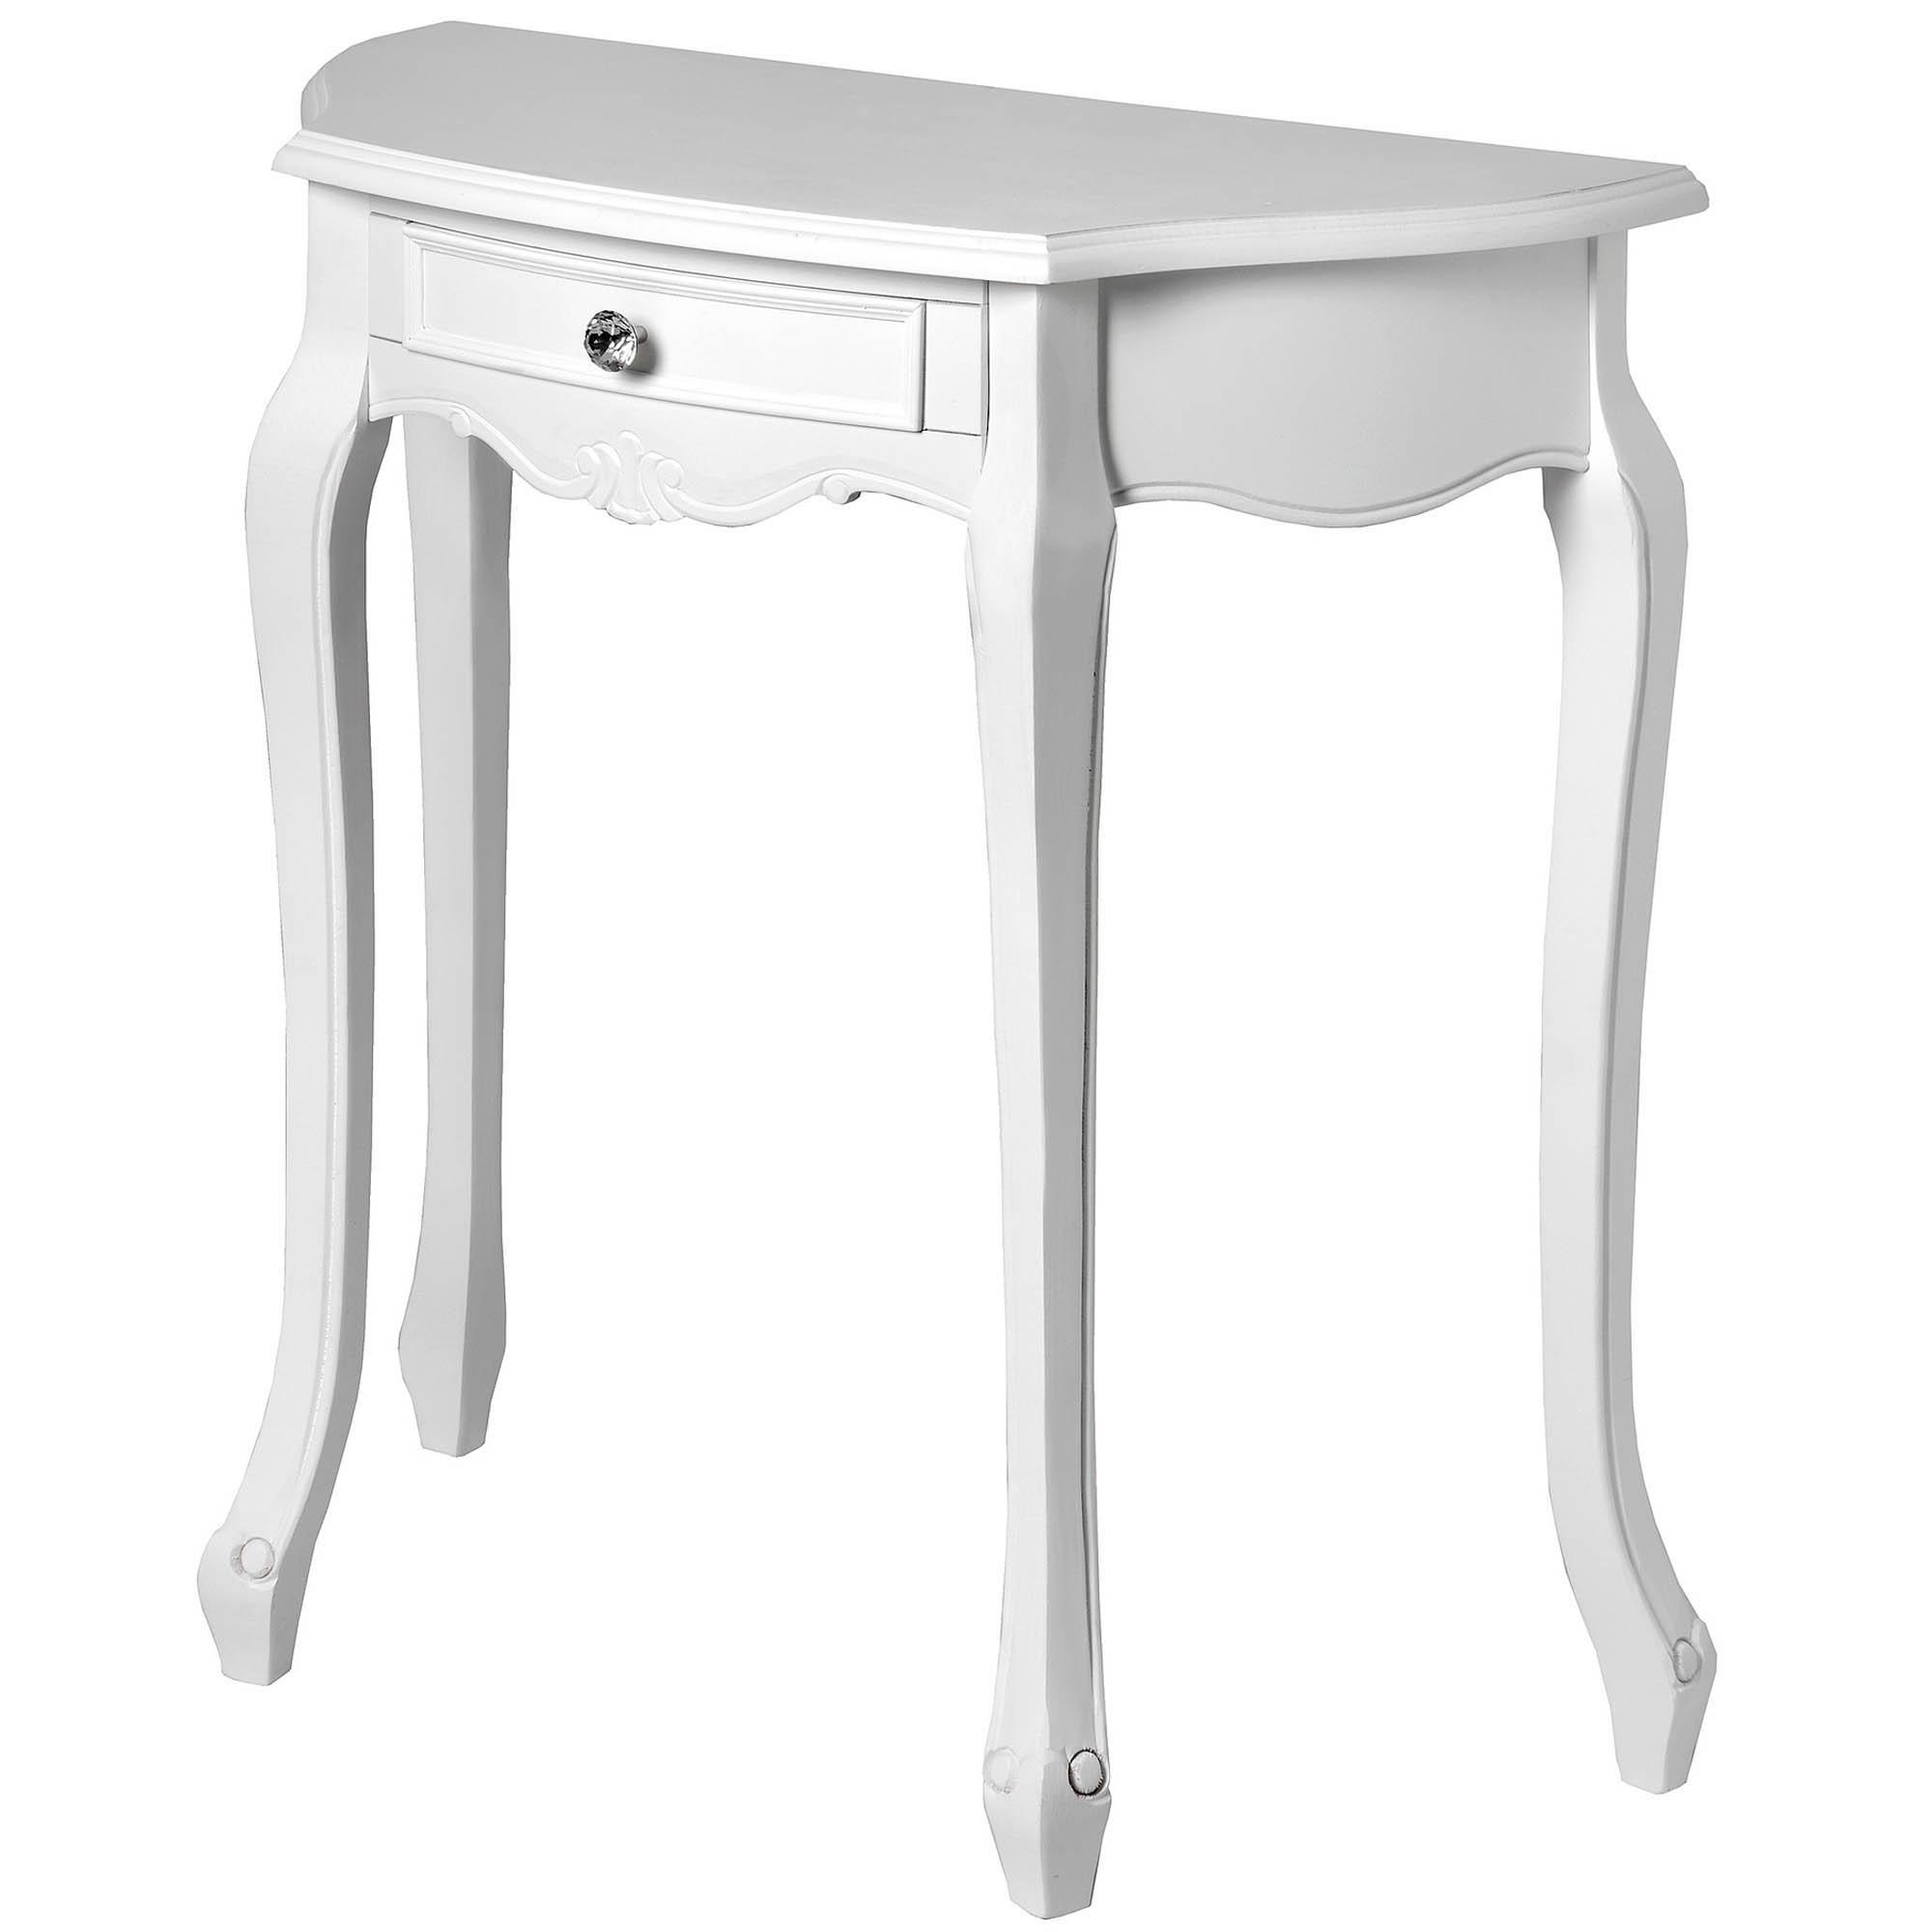 Fleur White Half Moon Shabby Chic Console Table